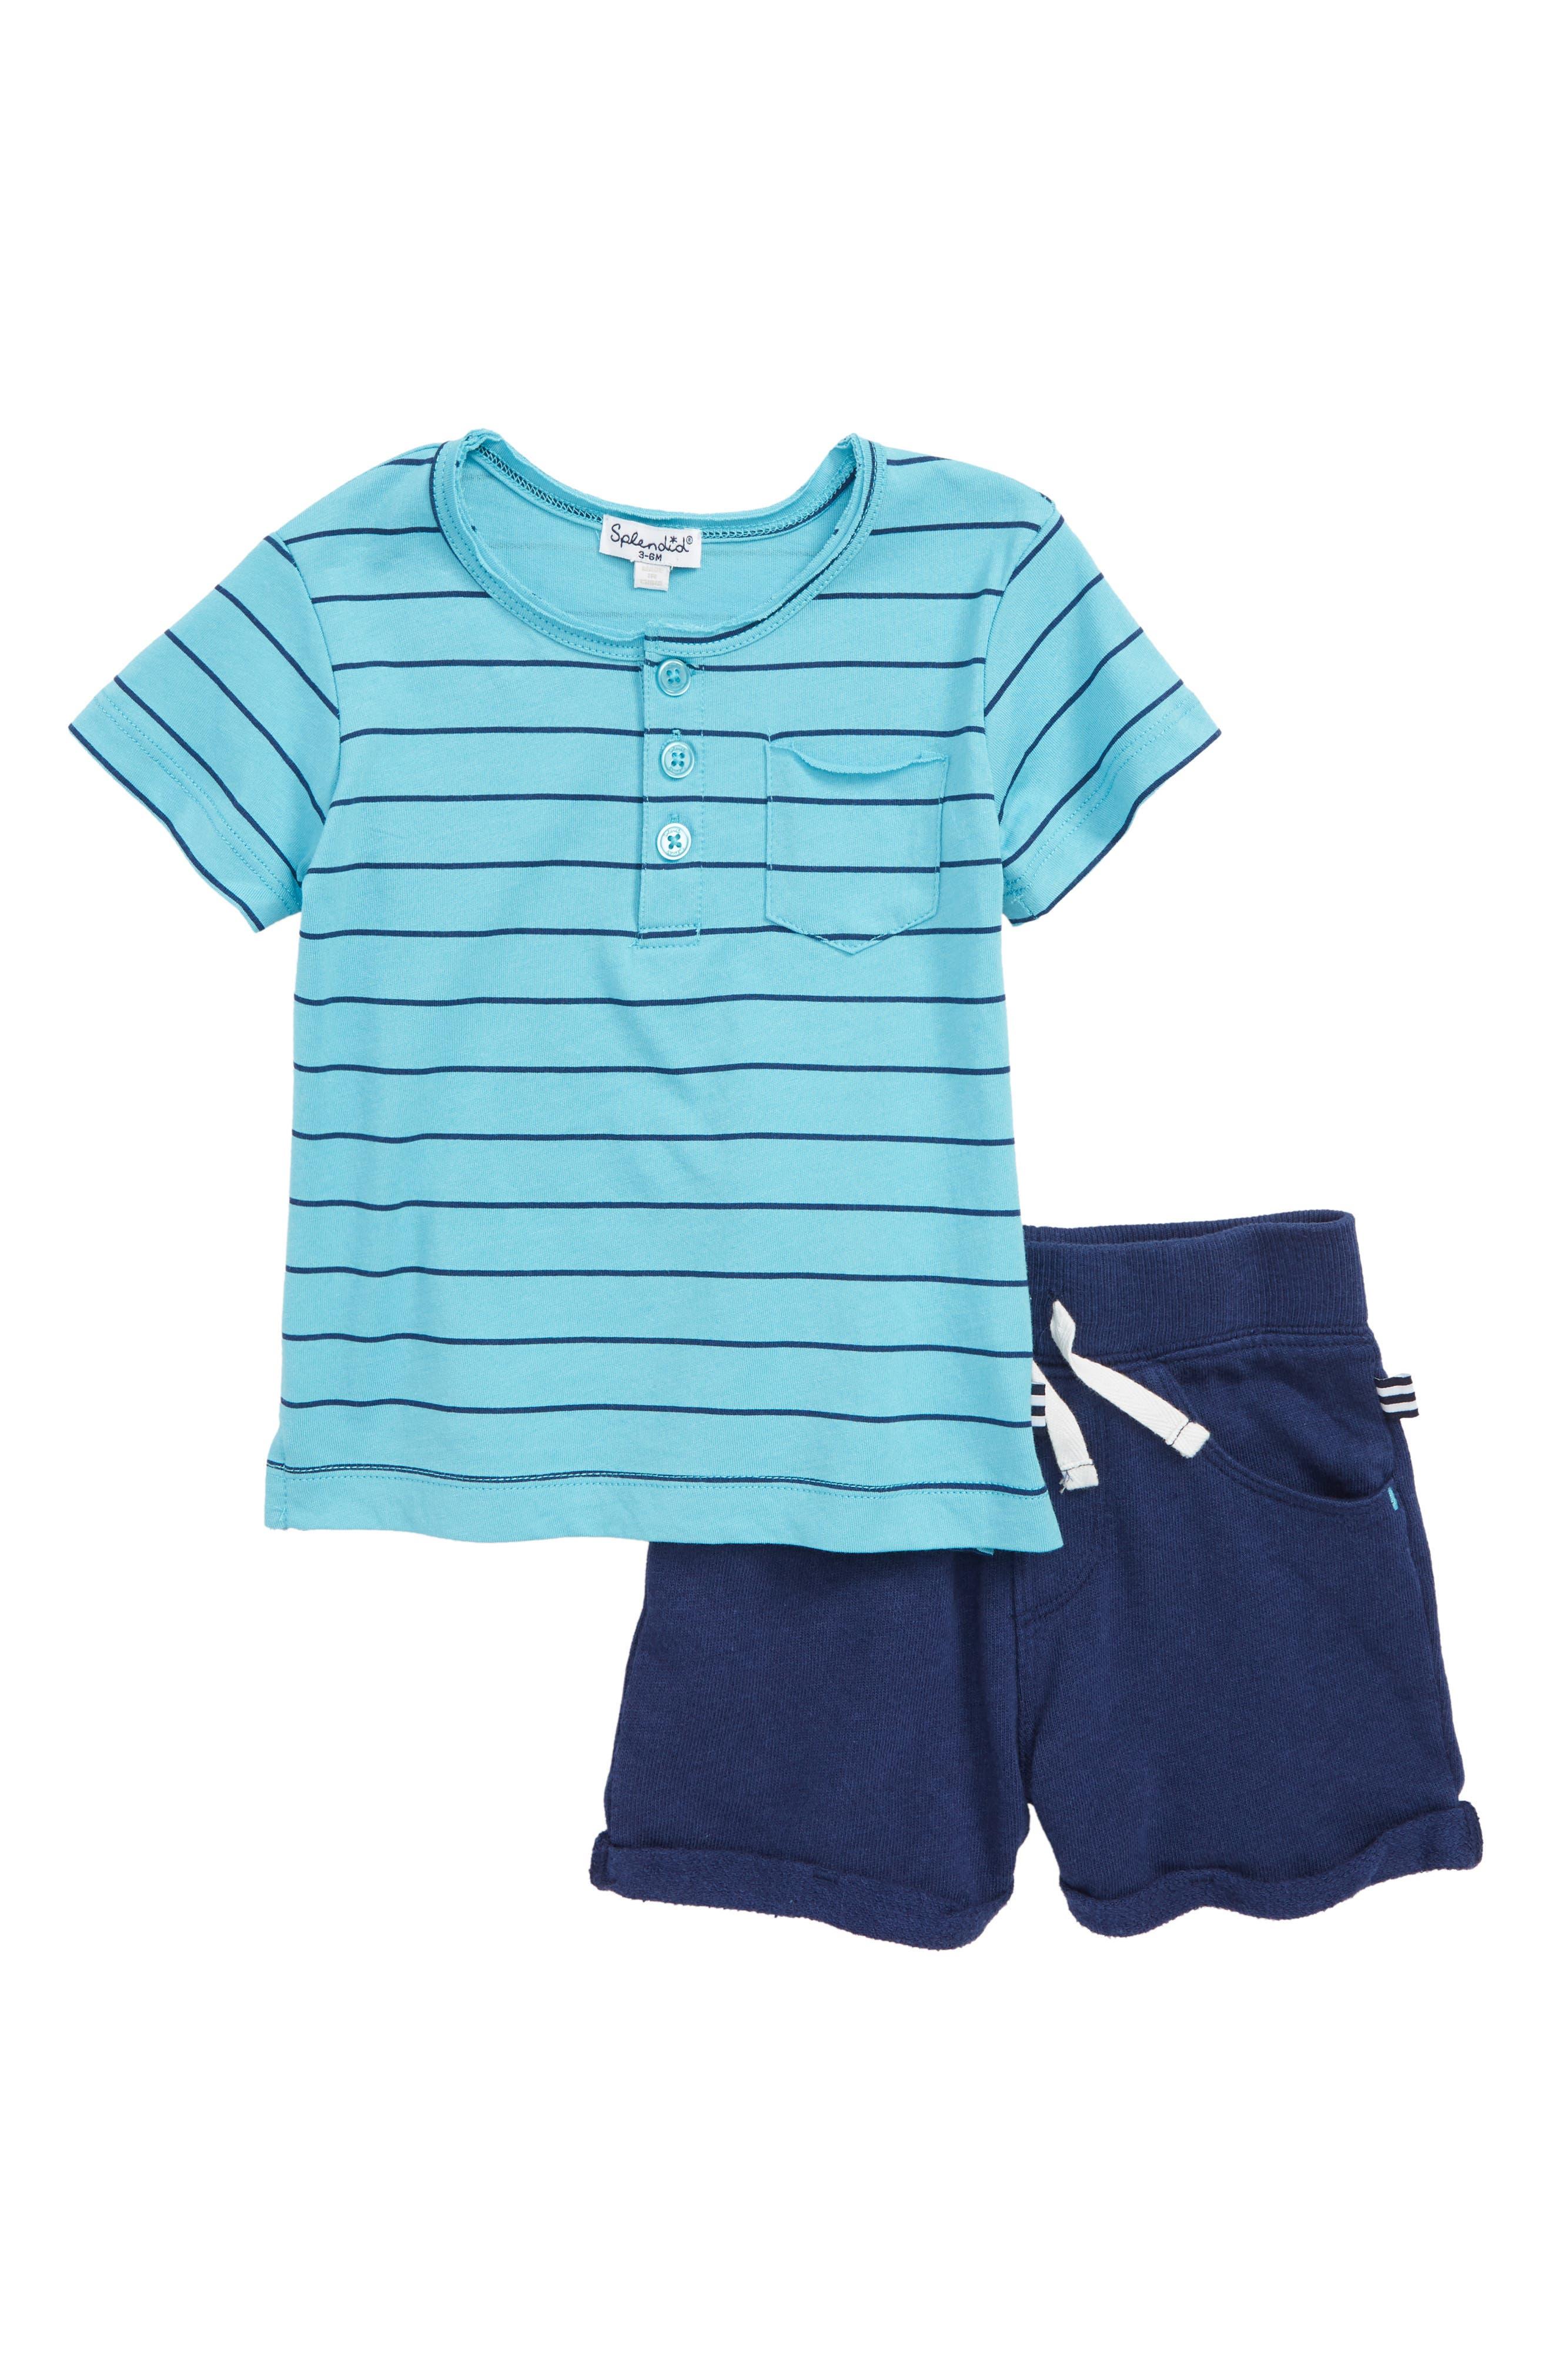 Henley T-Shirt & Shorts Set,                         Main,                         color, Maui Blue